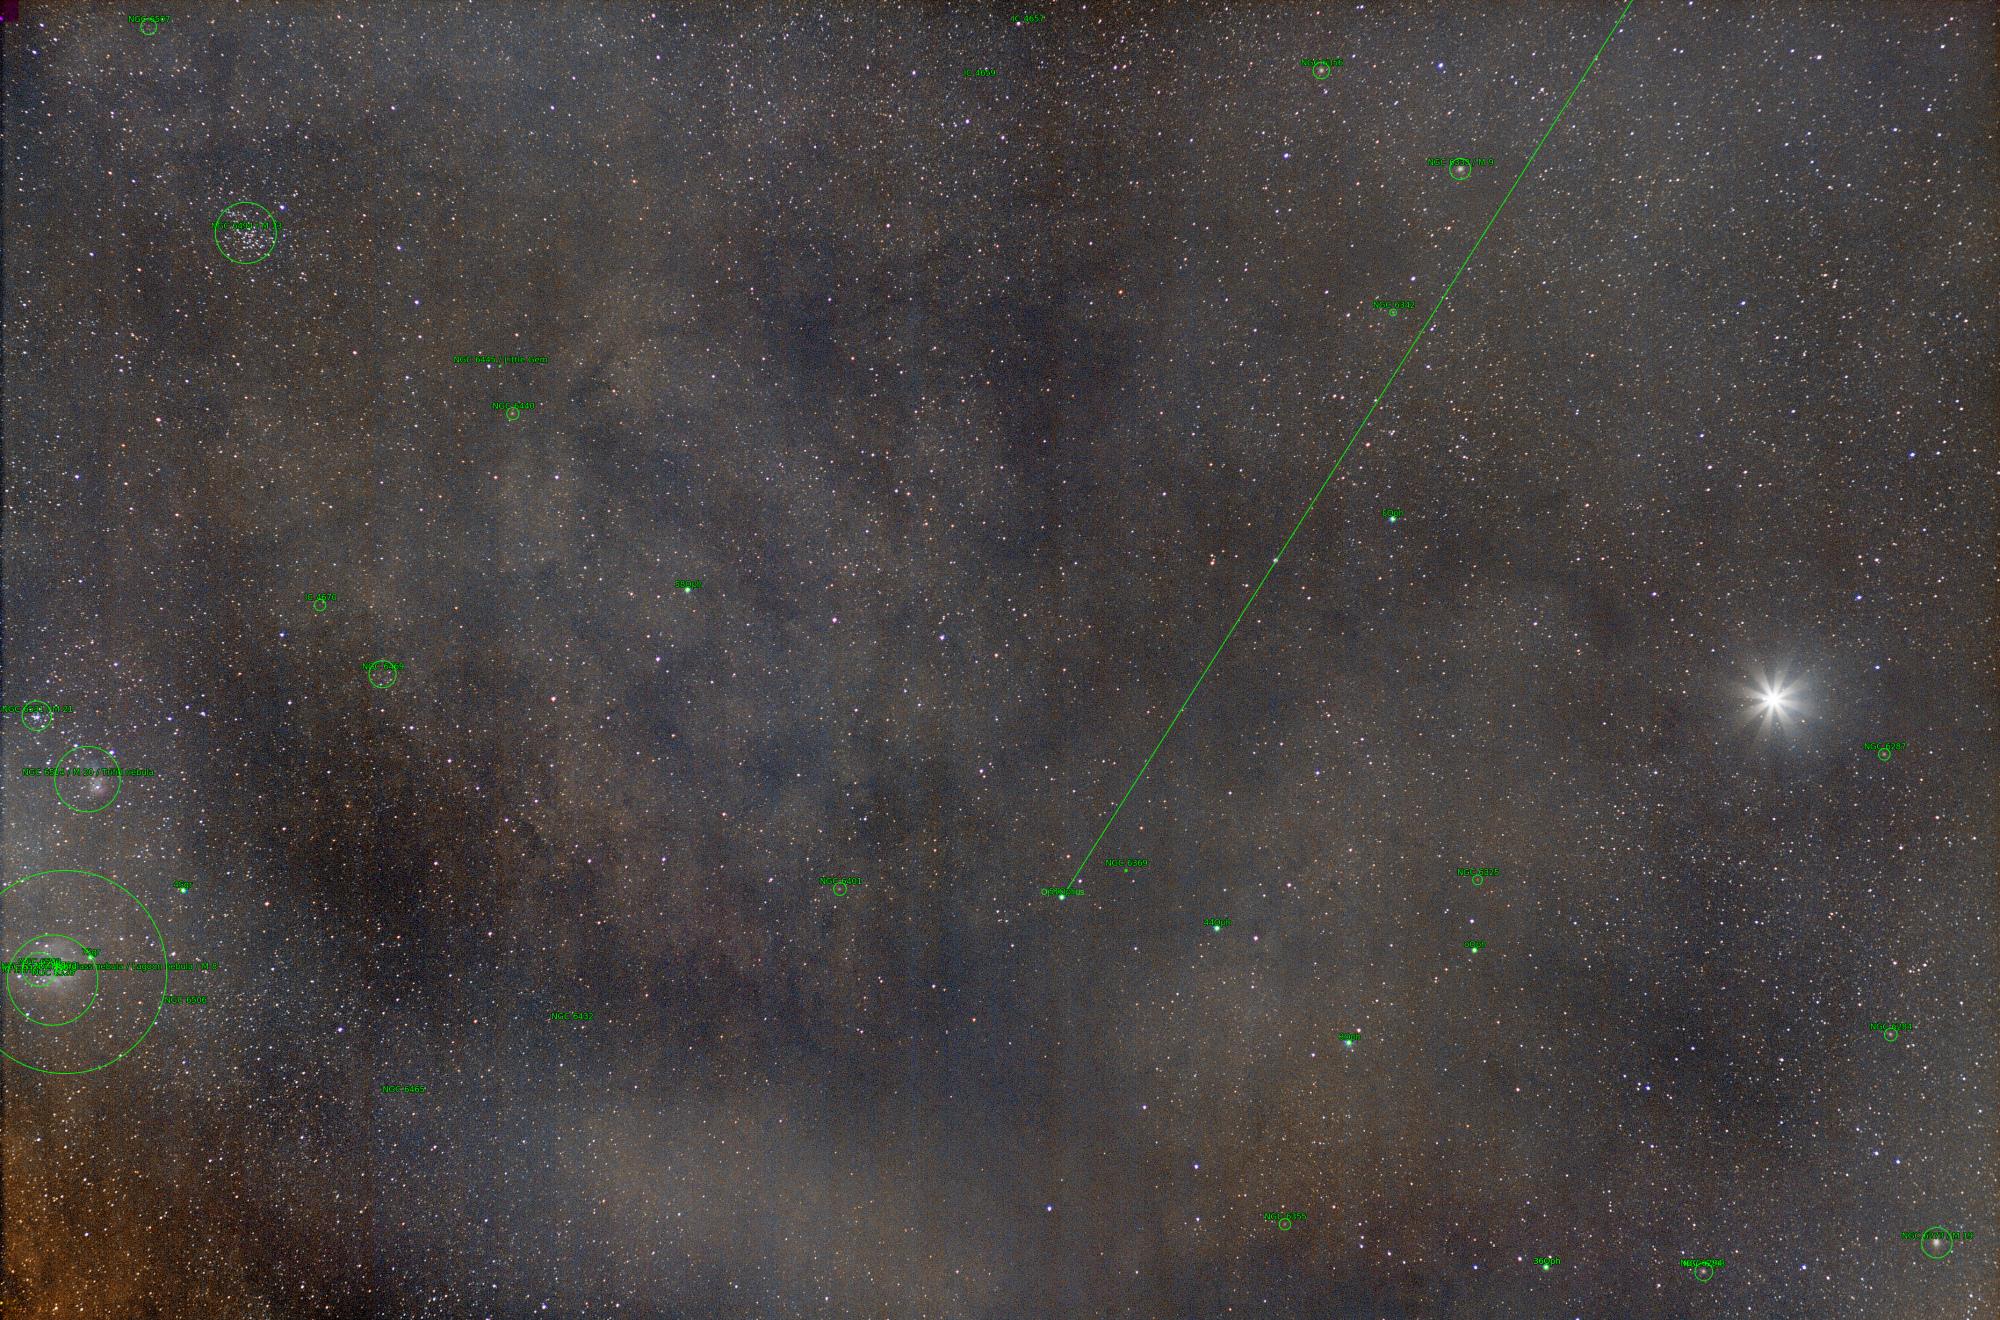 astrometry_net.thumb.jpg.6313ac2efa7c9864e11d366b3d43b308.jpg